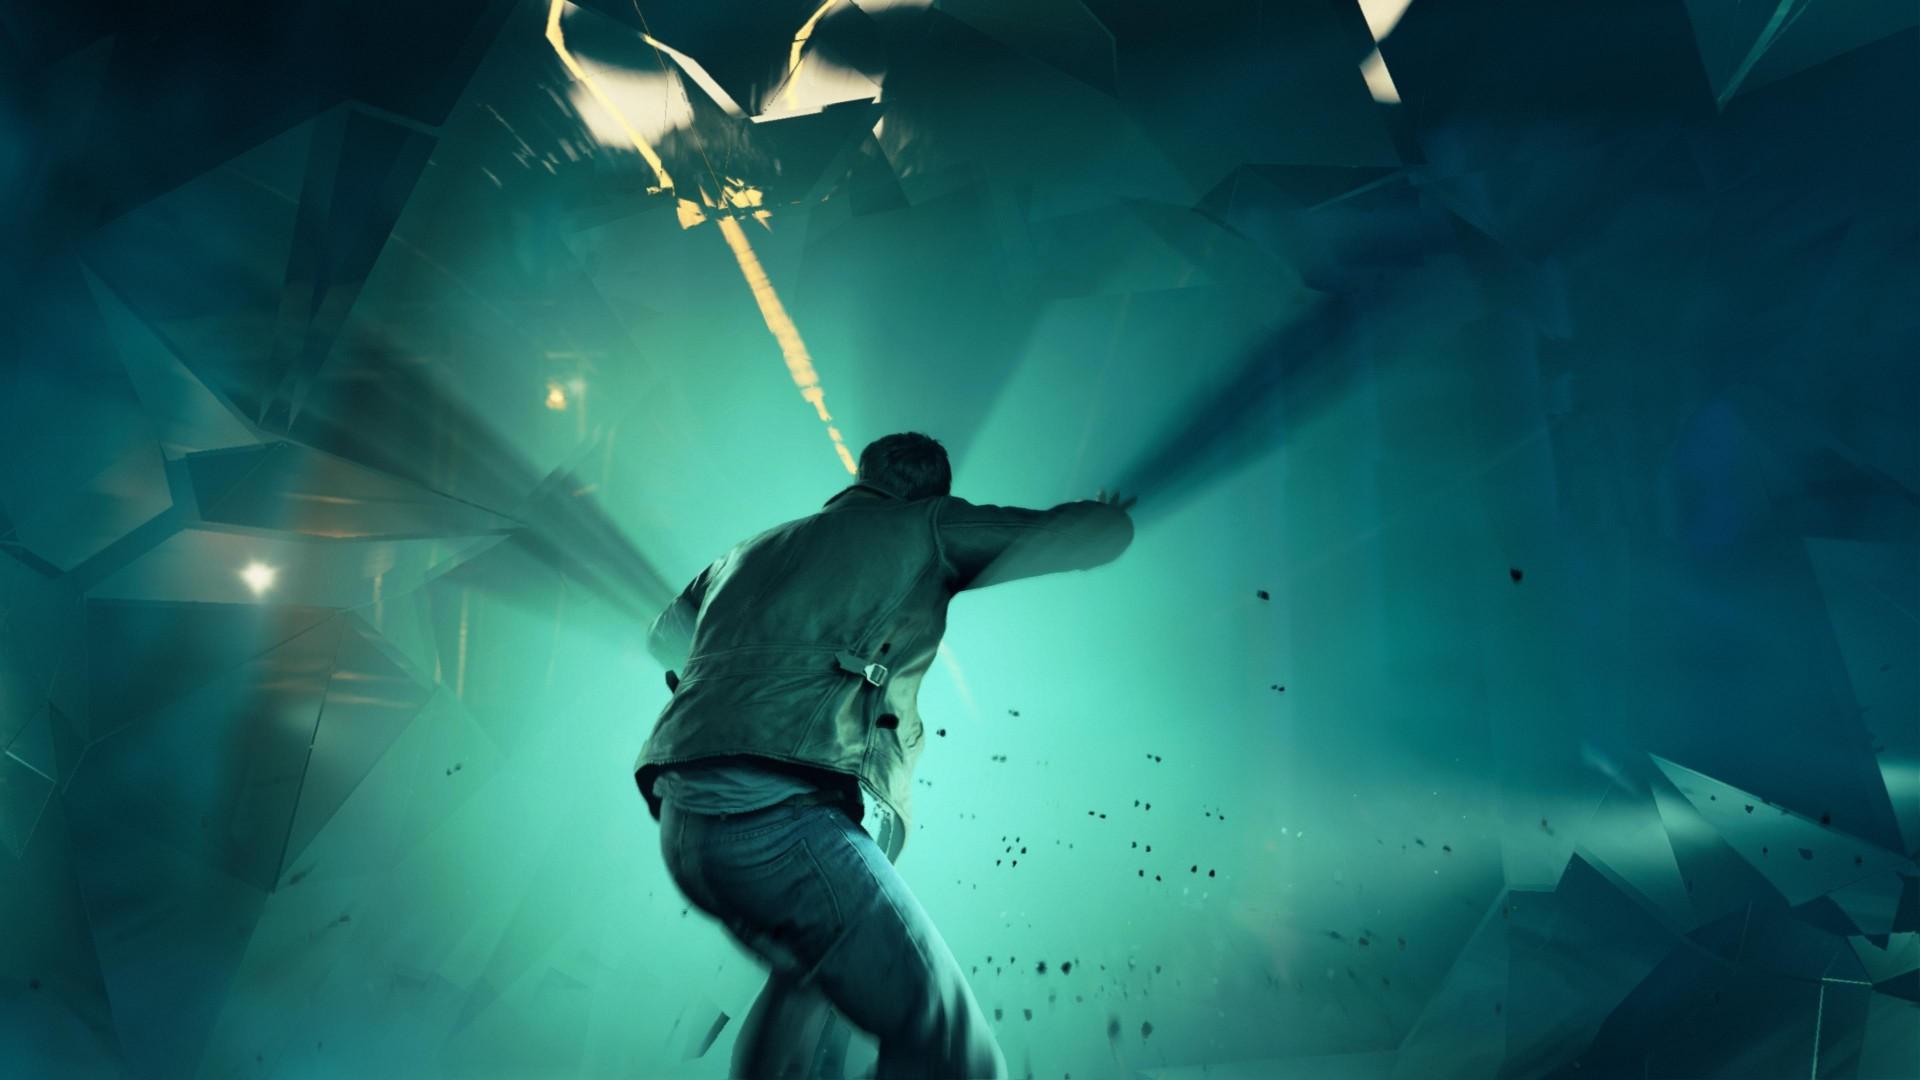 Wallpaper Quantum Break, shooter, Xbox One, Best Shooter 2016, Best Games of 2016, Games #10371